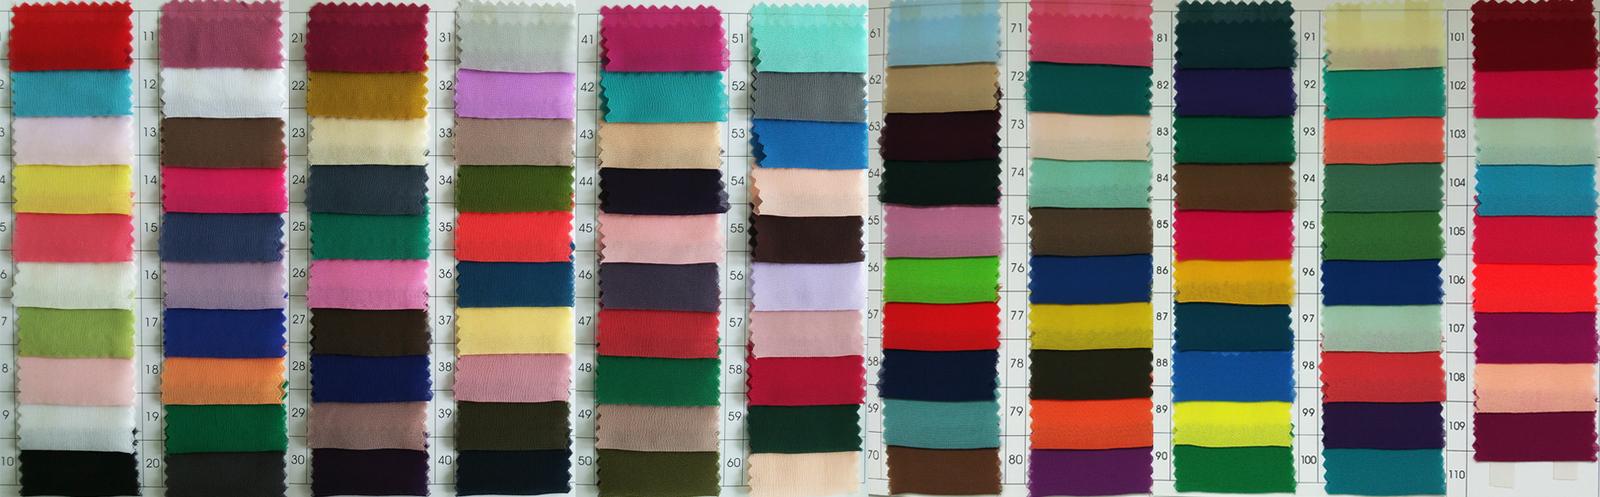 Silkychiffoncolor 1125